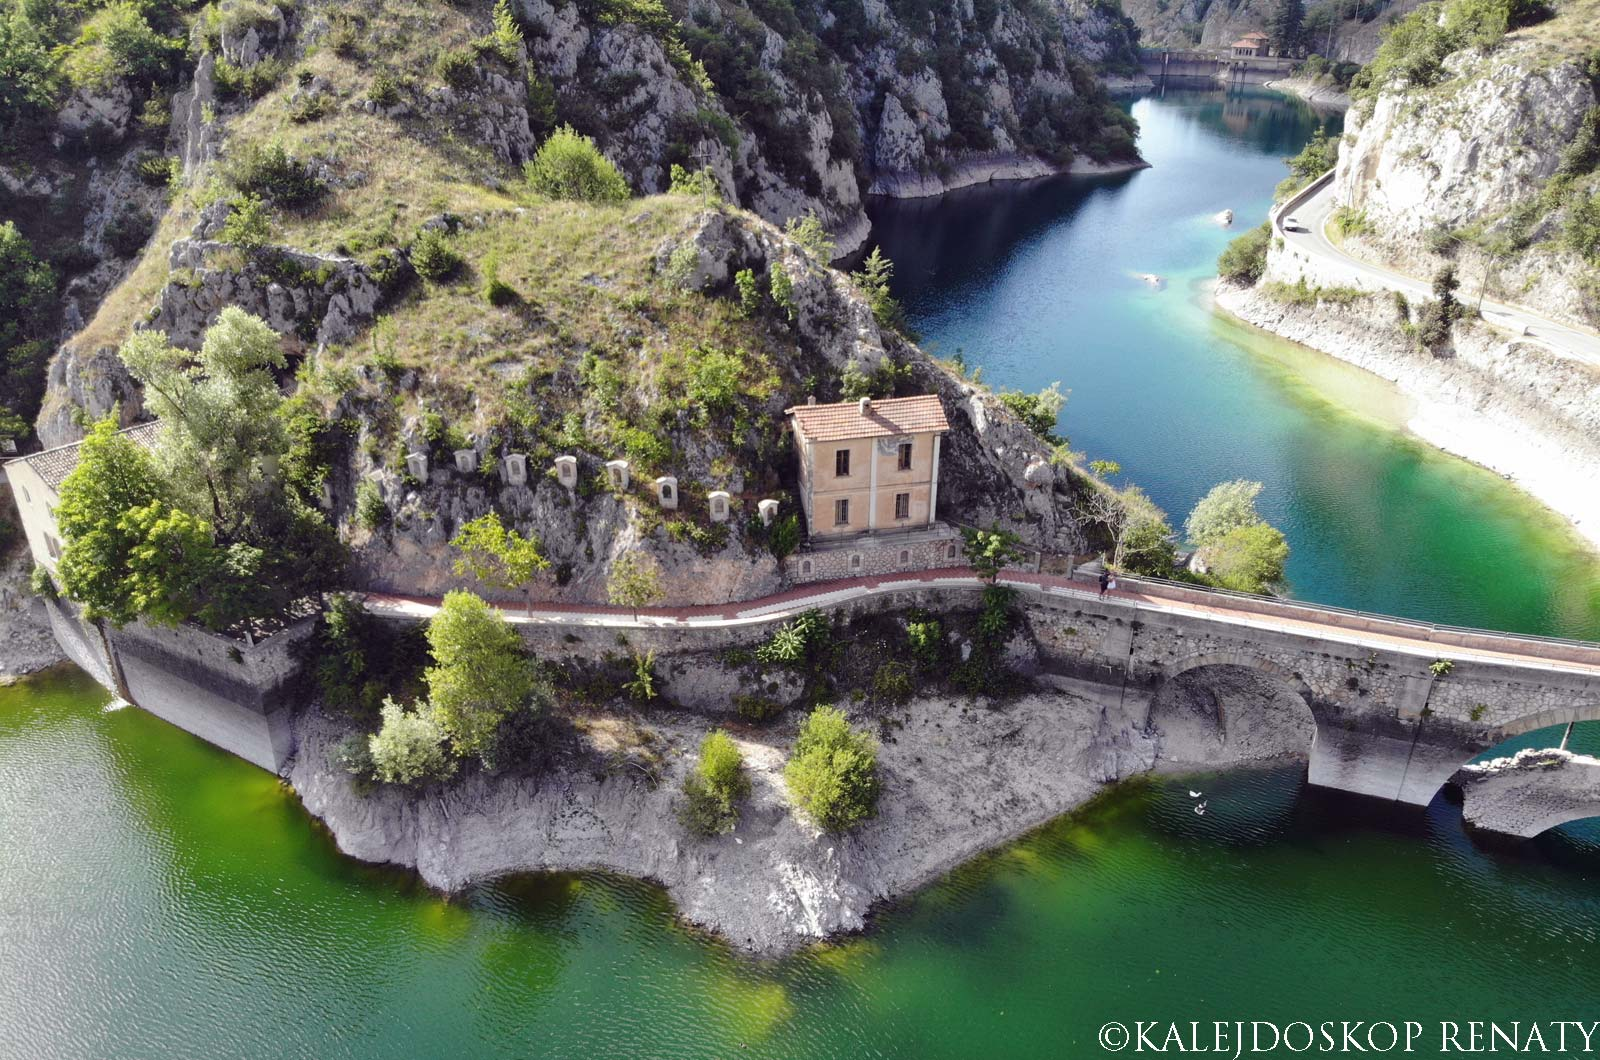 Jezioro San Domenico w Abruzji